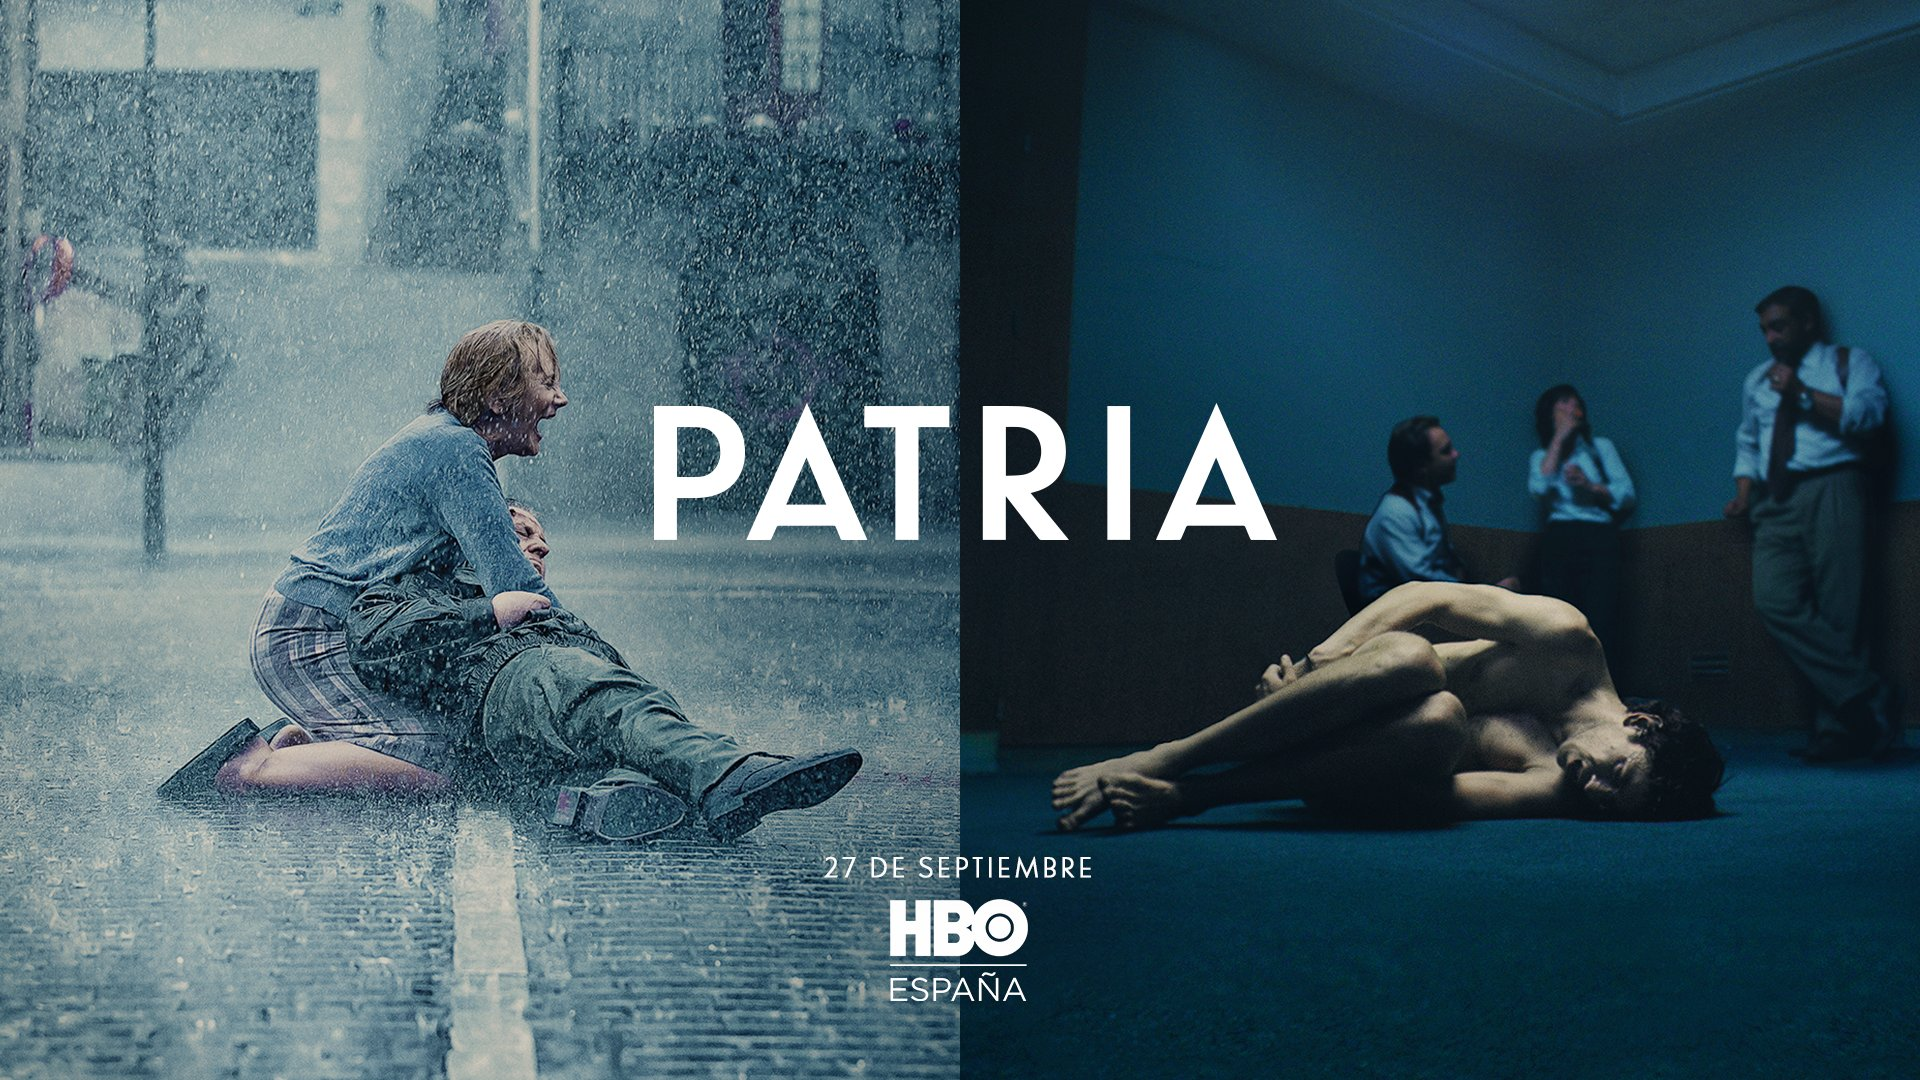 Patria (Serie HBO) Eg1ViCzWoAEPjtb?format=jpg&name=large